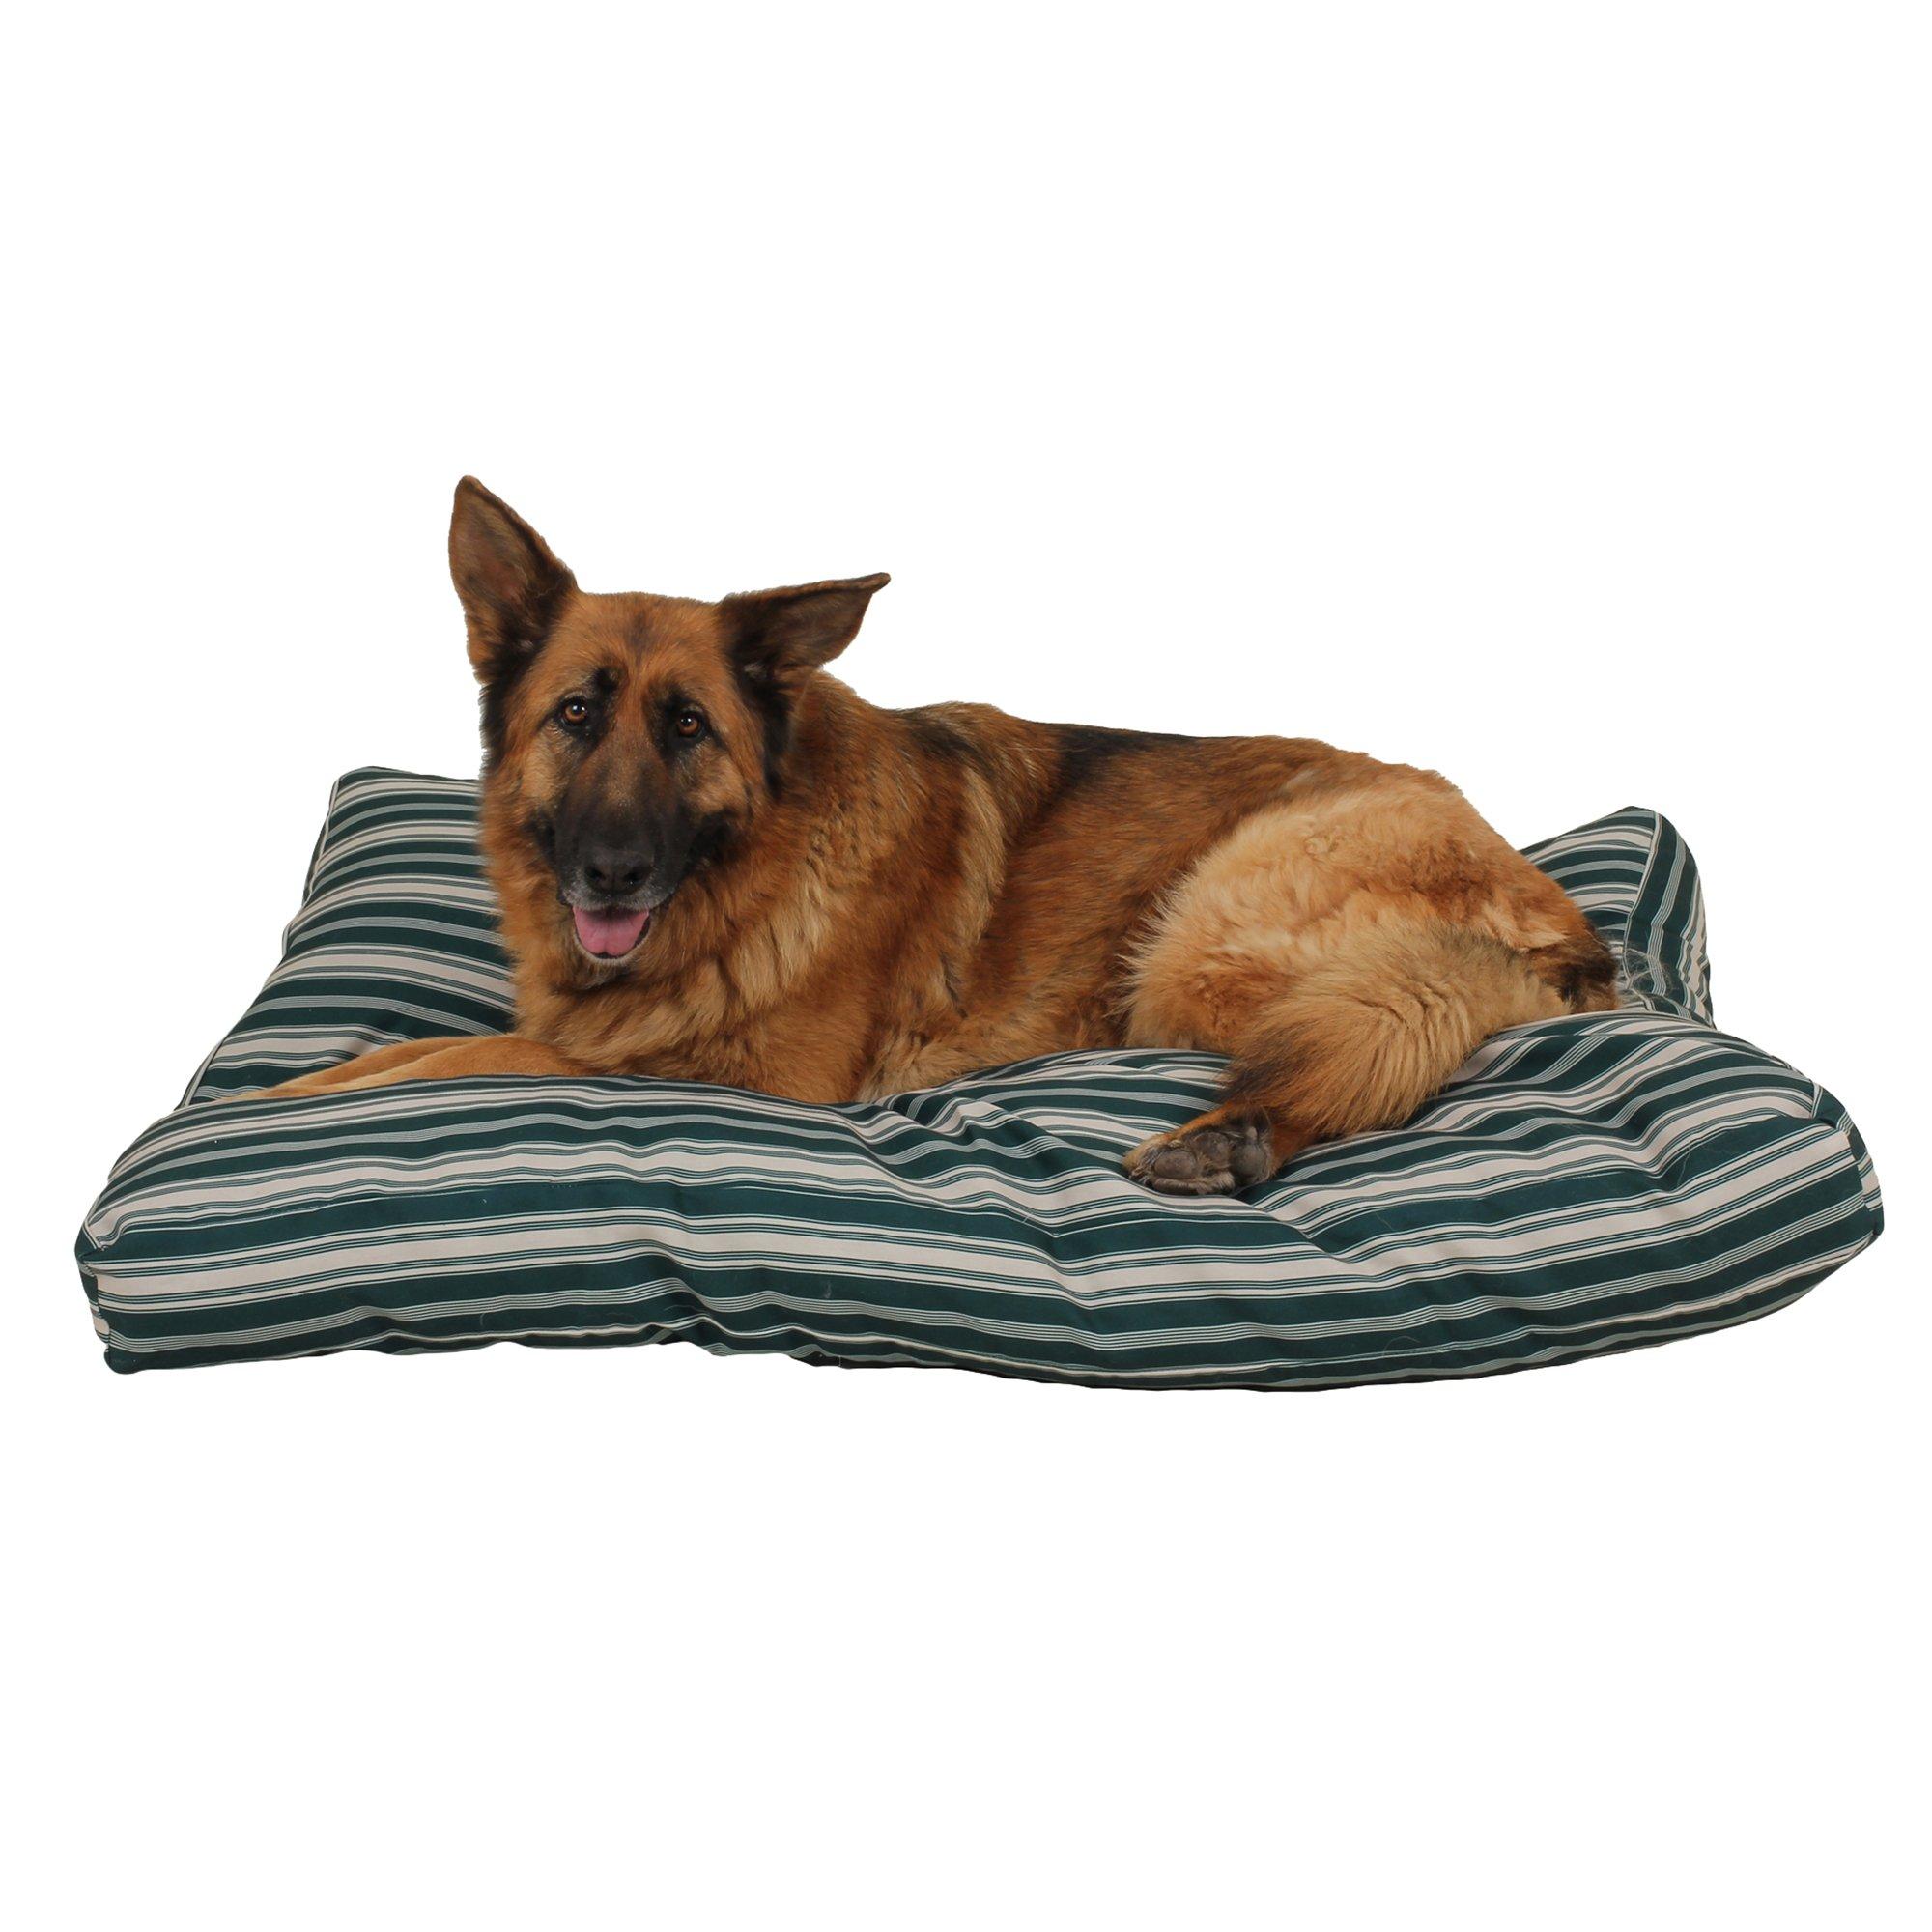 Carolina Pet Company Indoor Outdoor Jamison Green Striped Dog Bed